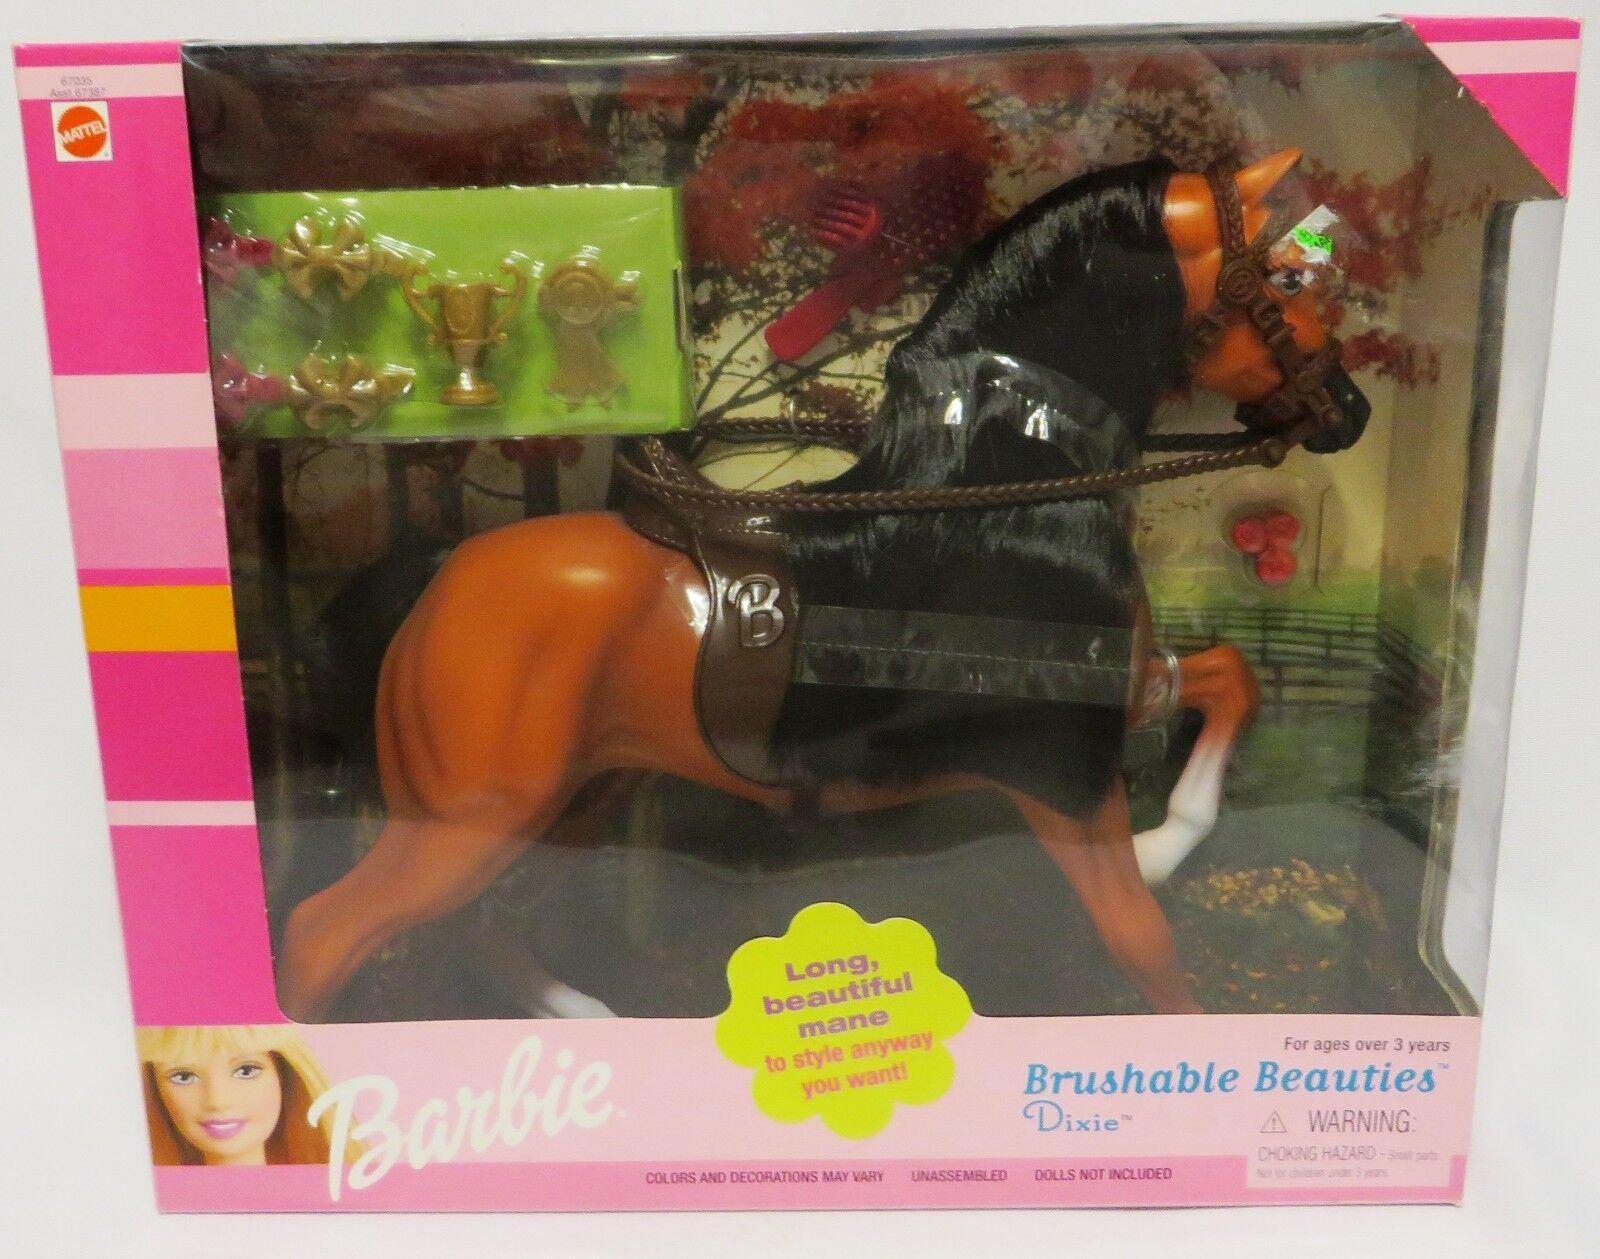 2000 nunca quitado de la Caja Mattel Peinables bellezas  Dixie  caballo de Barbie en caja sellada